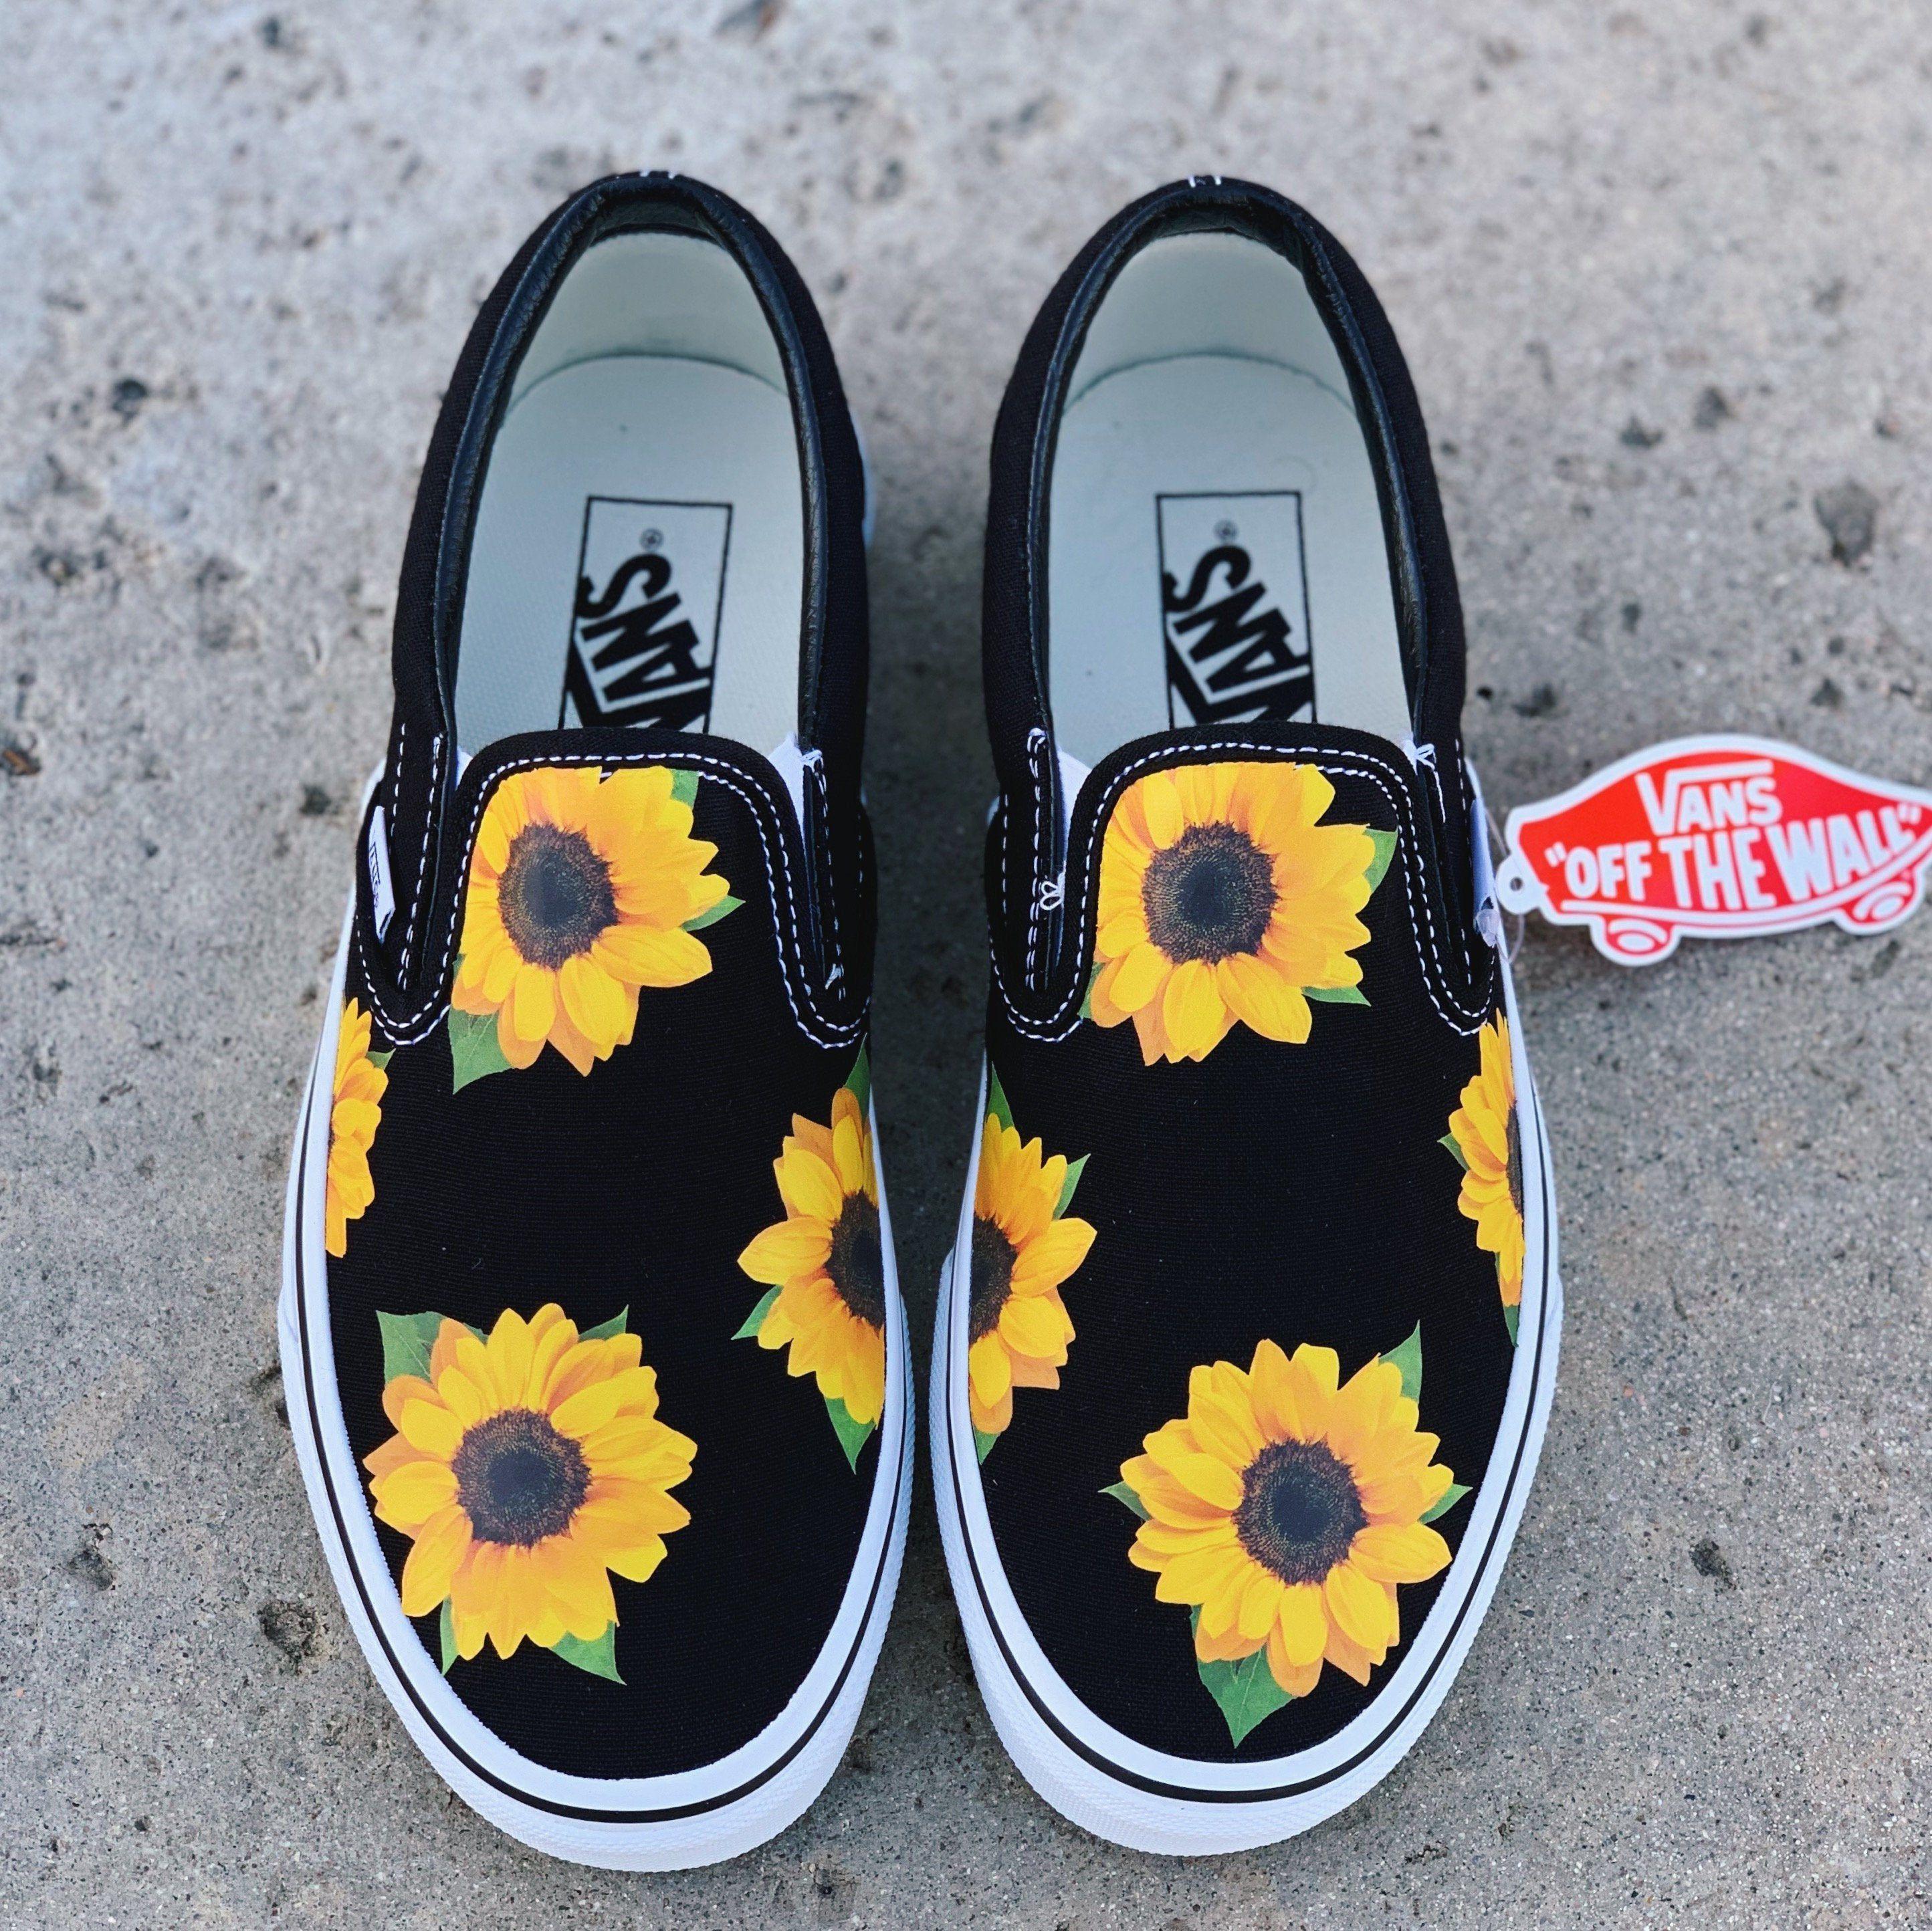 Sunflower Shoes Summer Shoes Custom Vans Shoes Vans Custom